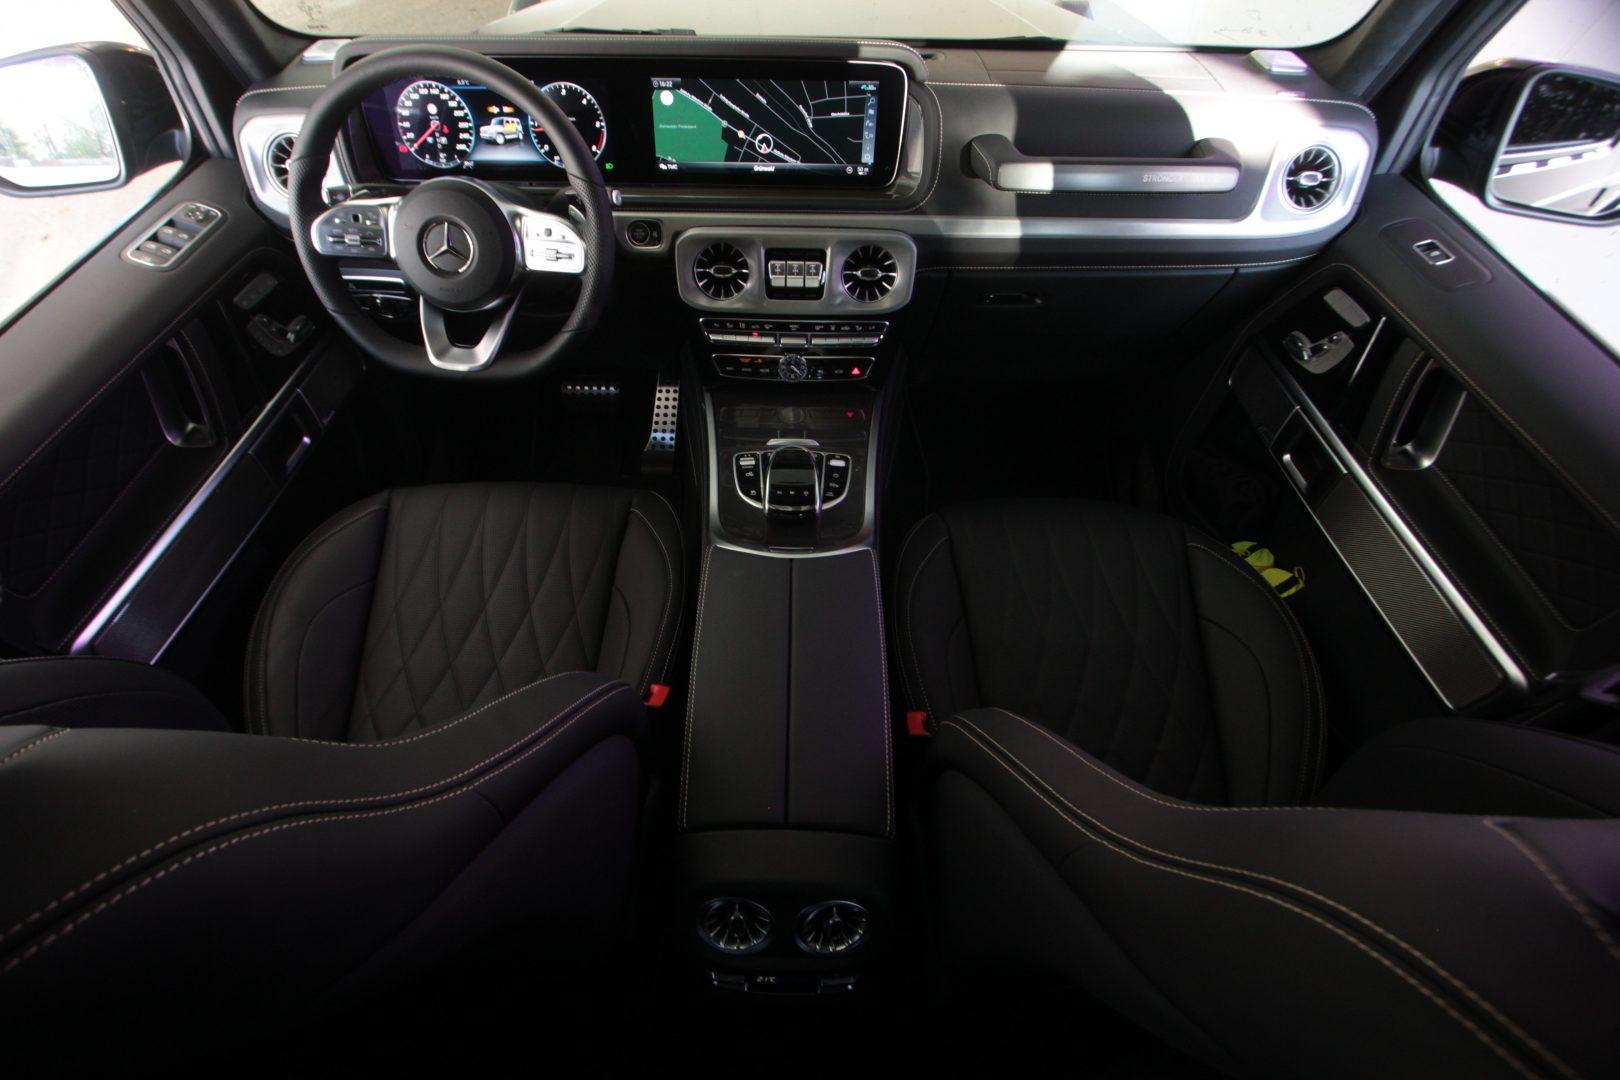 AIL Mercedes-Benz G 400 d Stronger than time Edition 9